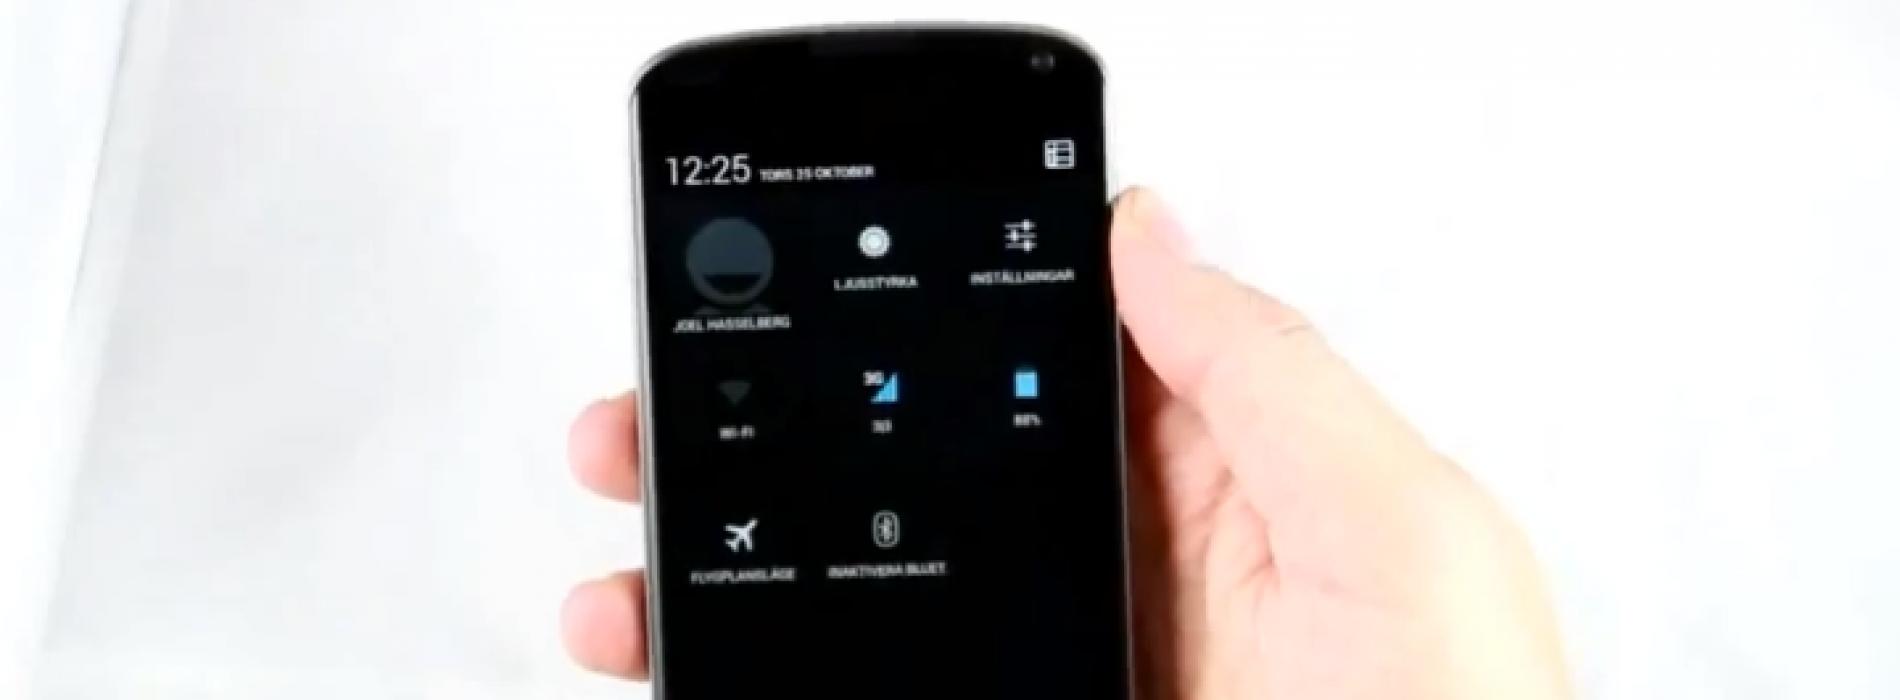 Short video of Nexus 4 shows quick settings, multi-user